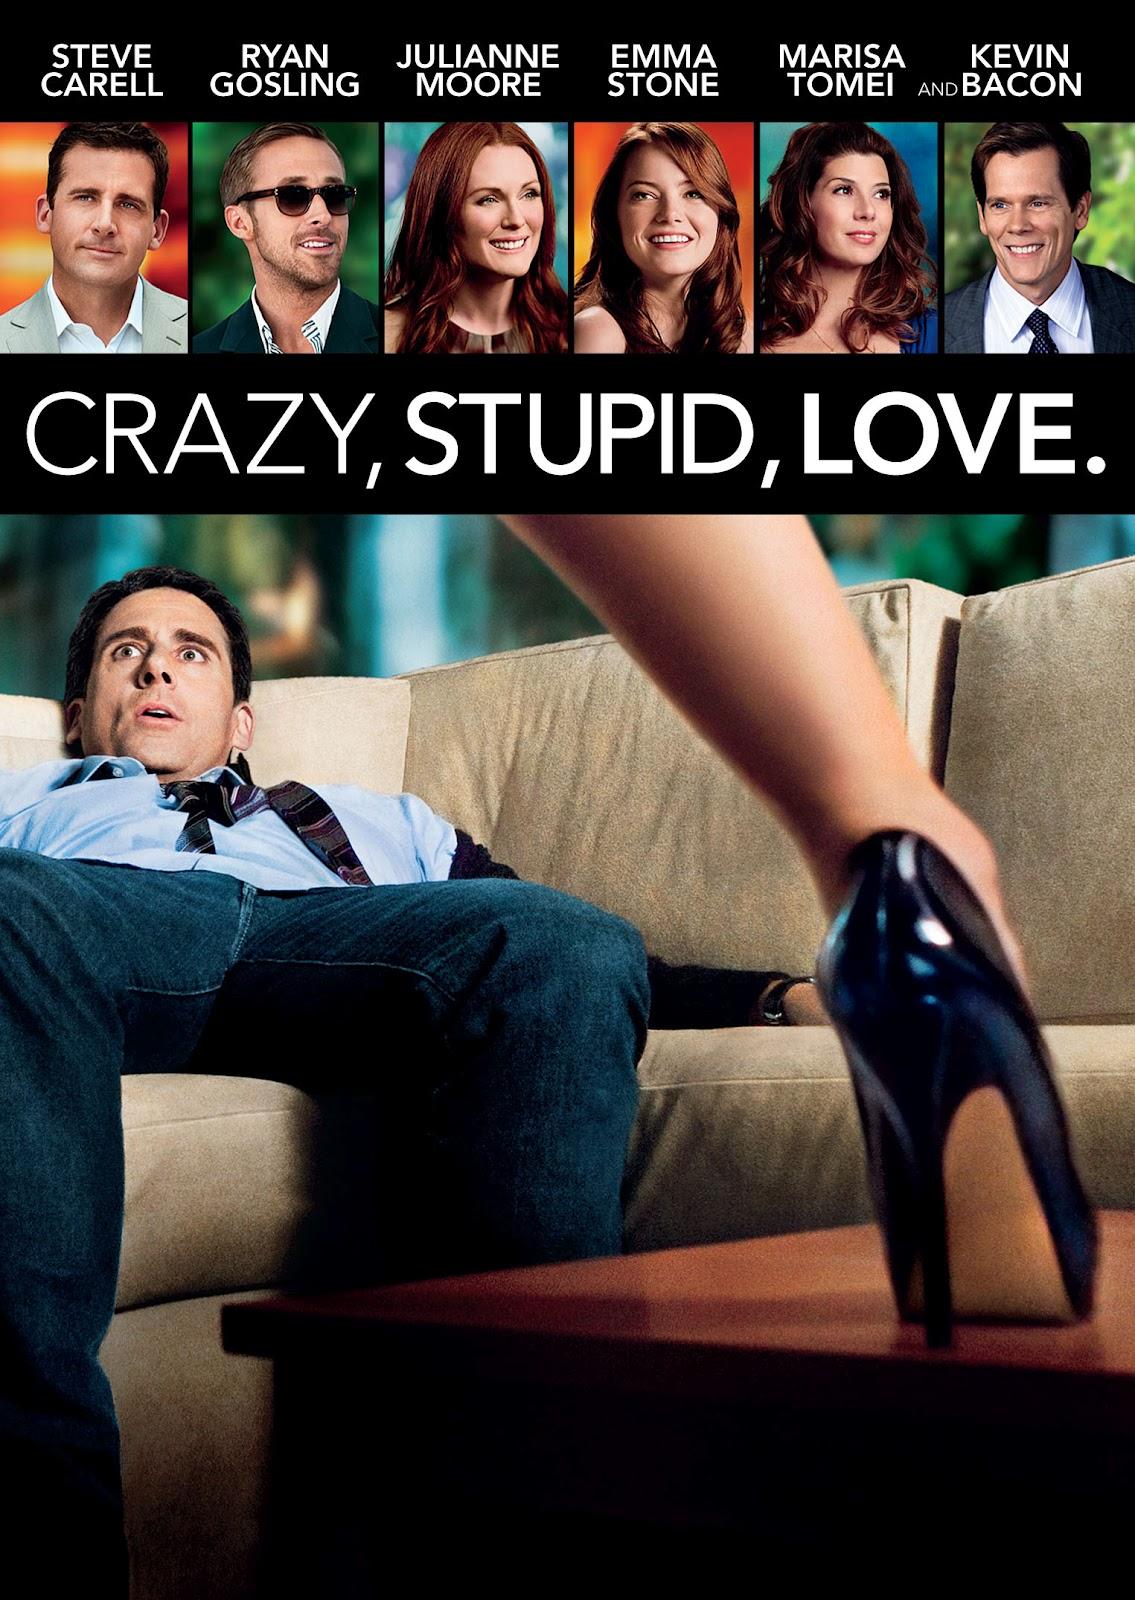 http://1.bp.blogspot.com/-cPhdzuNjdy0/T7yu5NPGO5I/AAAAAAAAA0s/cVX-SVXSj6s/s1600/CRAZY_STUPID_LOVE_DVD(KEYART).jpg